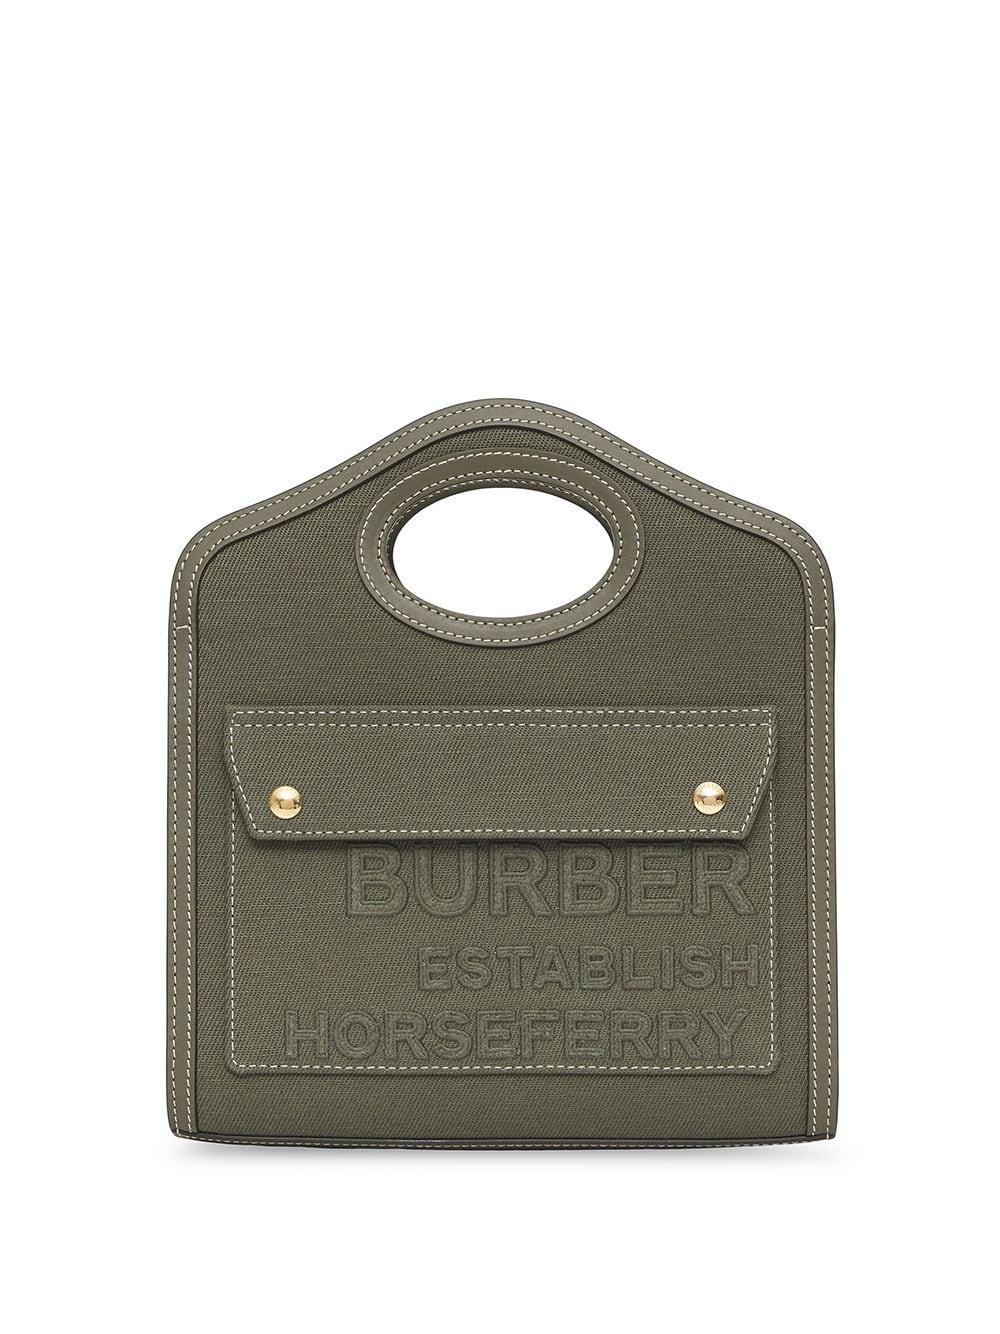 Burberry Mini Handtasche - Grün